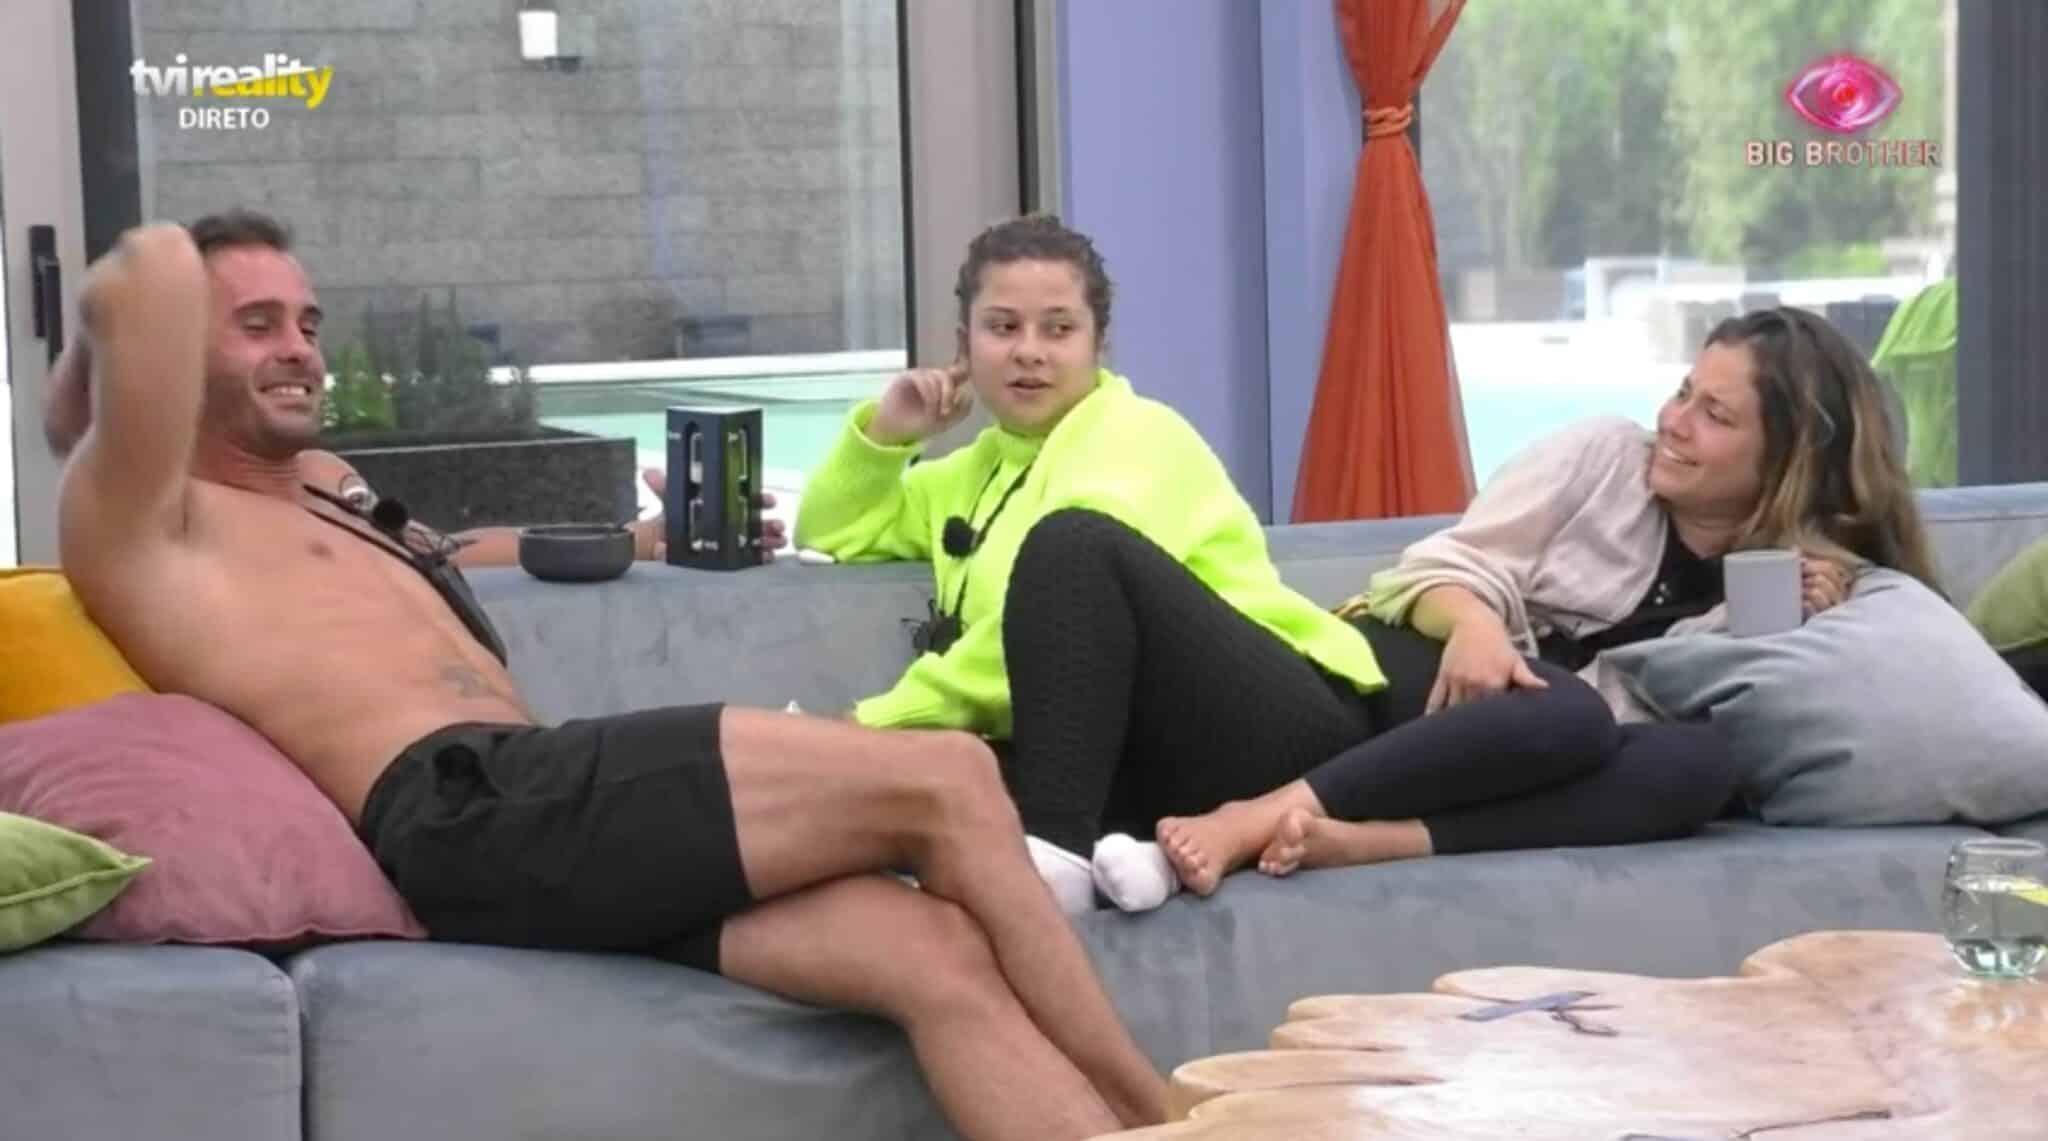 Big Brother Sandrina Ana Catharina Scaled Big Brother. Sandrina Manda Nova Calinada: &Quot;Tenho Uma Fã Da Ampulheta Da Serra&Quot;